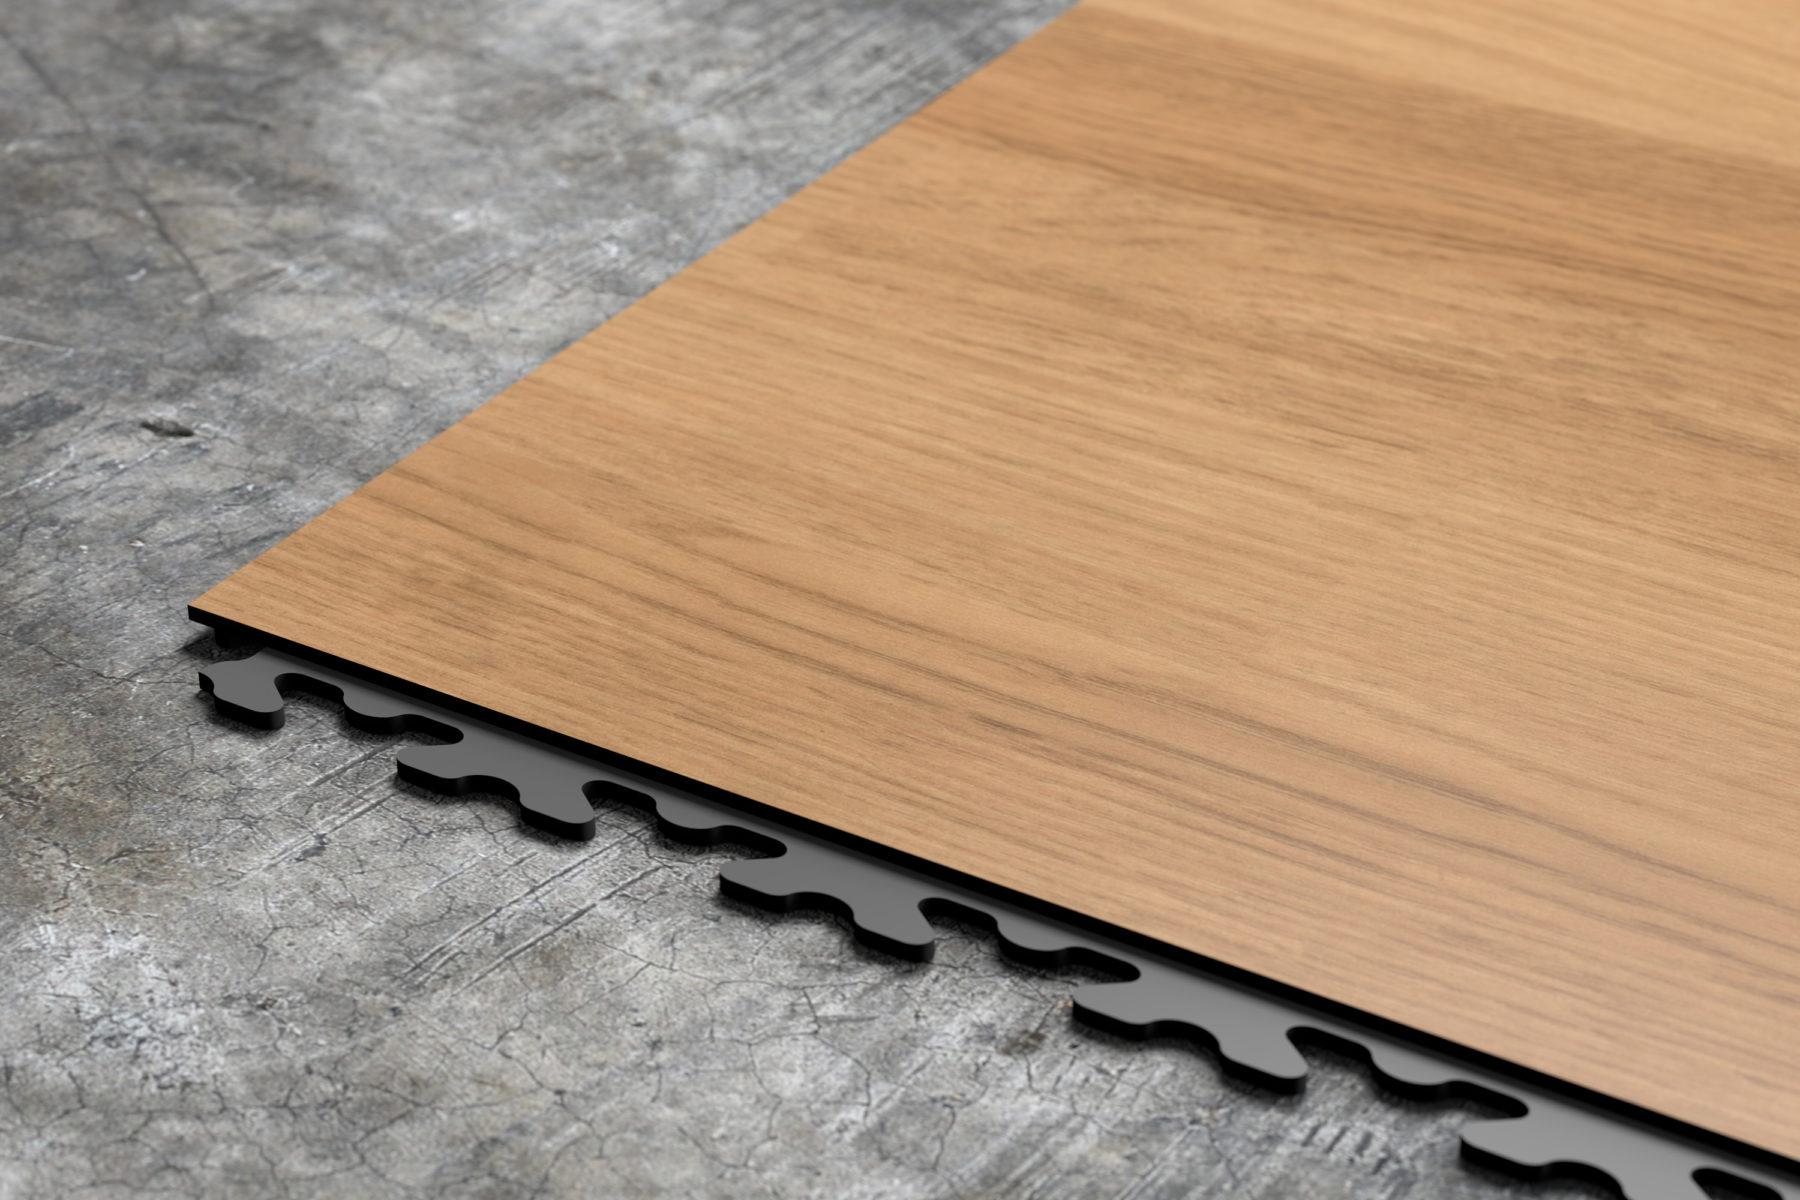 pvc-fliese-boden-platte-jp-home-decor-wood-holzlook-verdeckte-verbindung-wohnräume-gewerbe-1